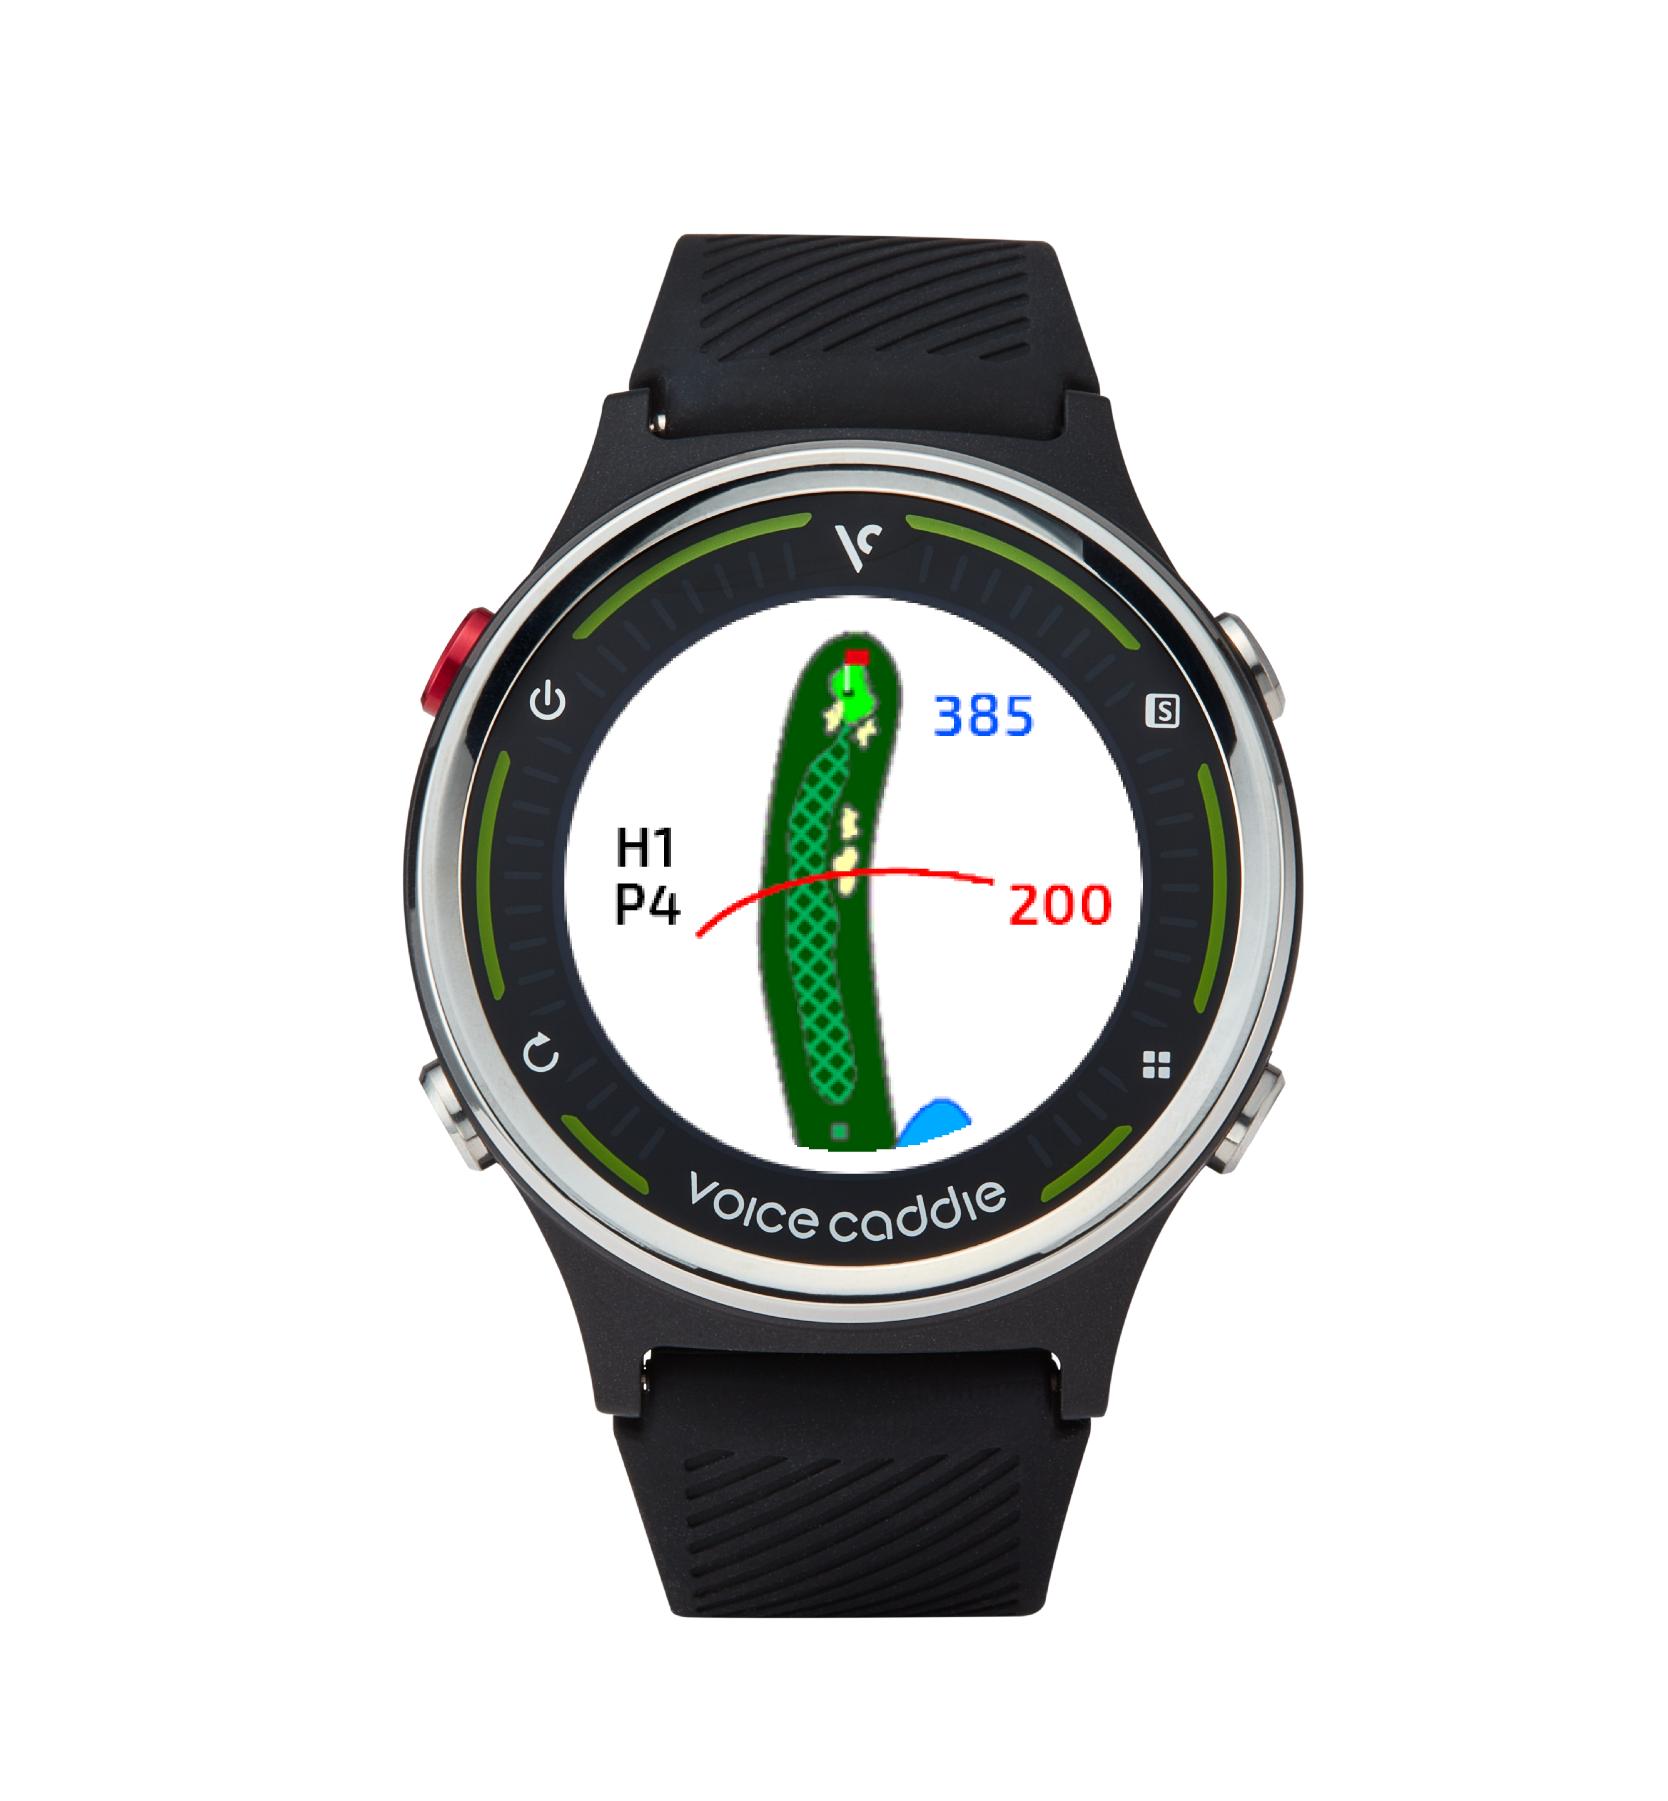 G1 Golf GPS Watch W/ Green Undulation And Slope